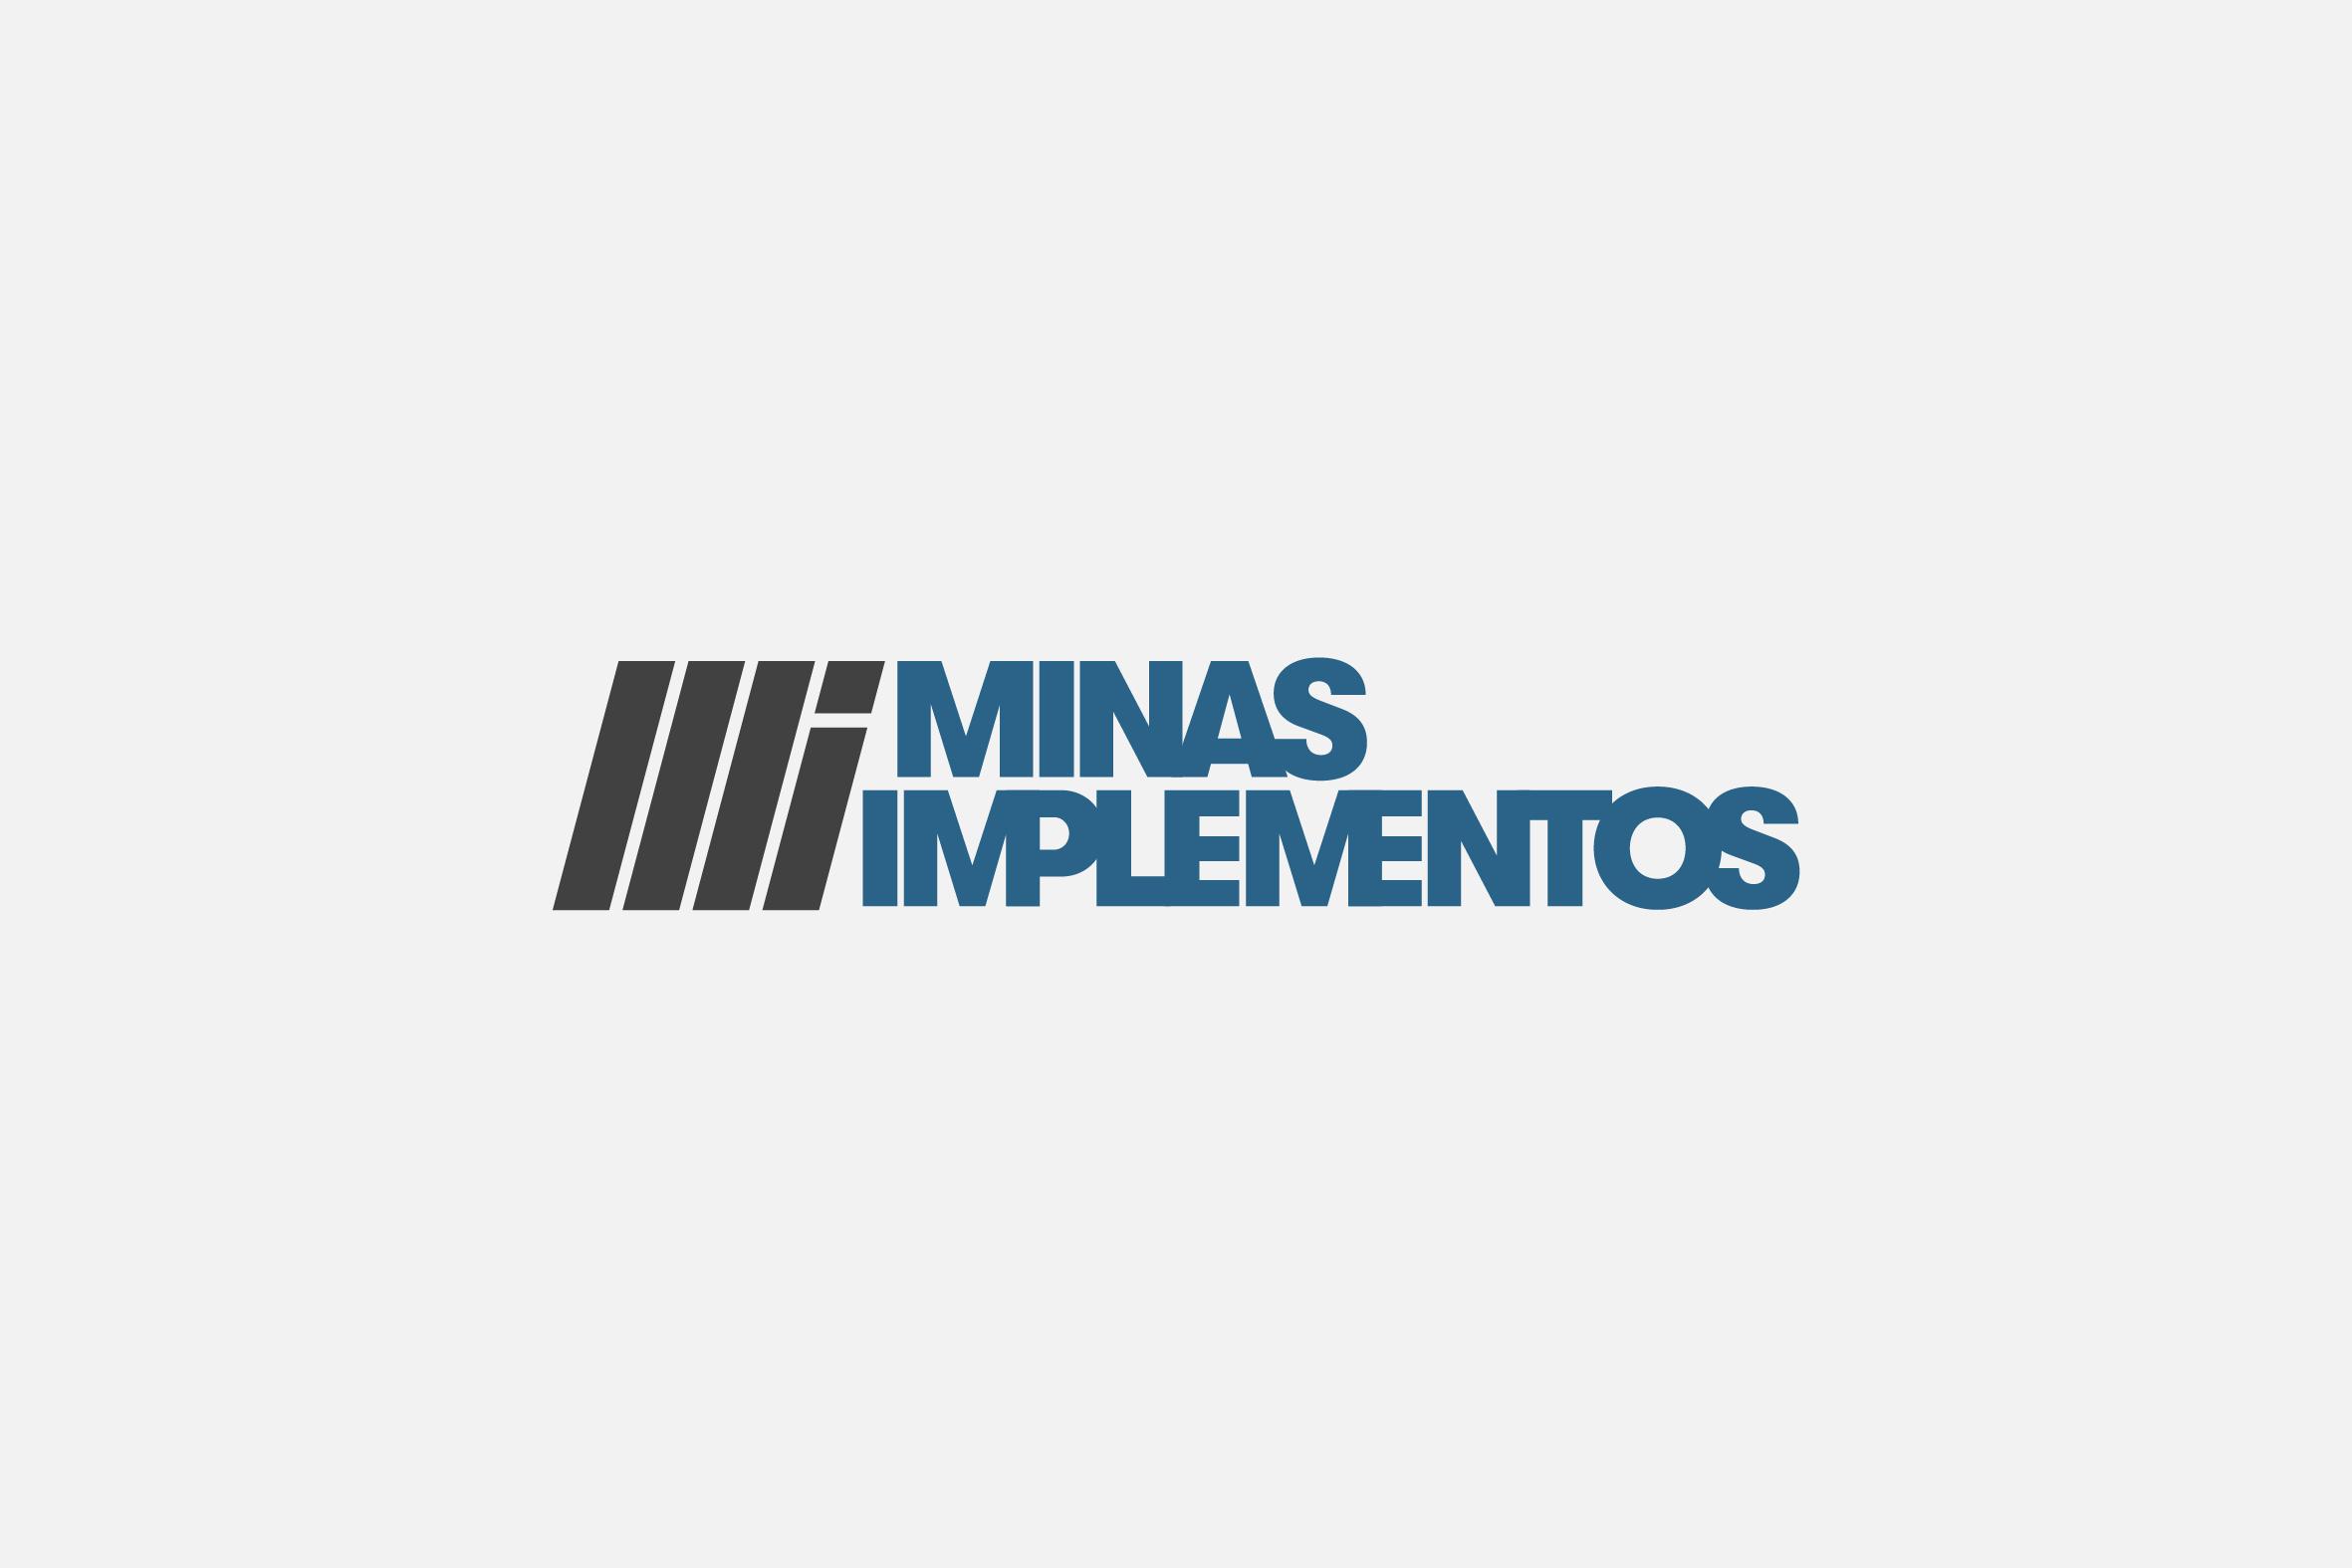 Logo-Minas-Implementos-Daniel-Cavalcanti-01-2